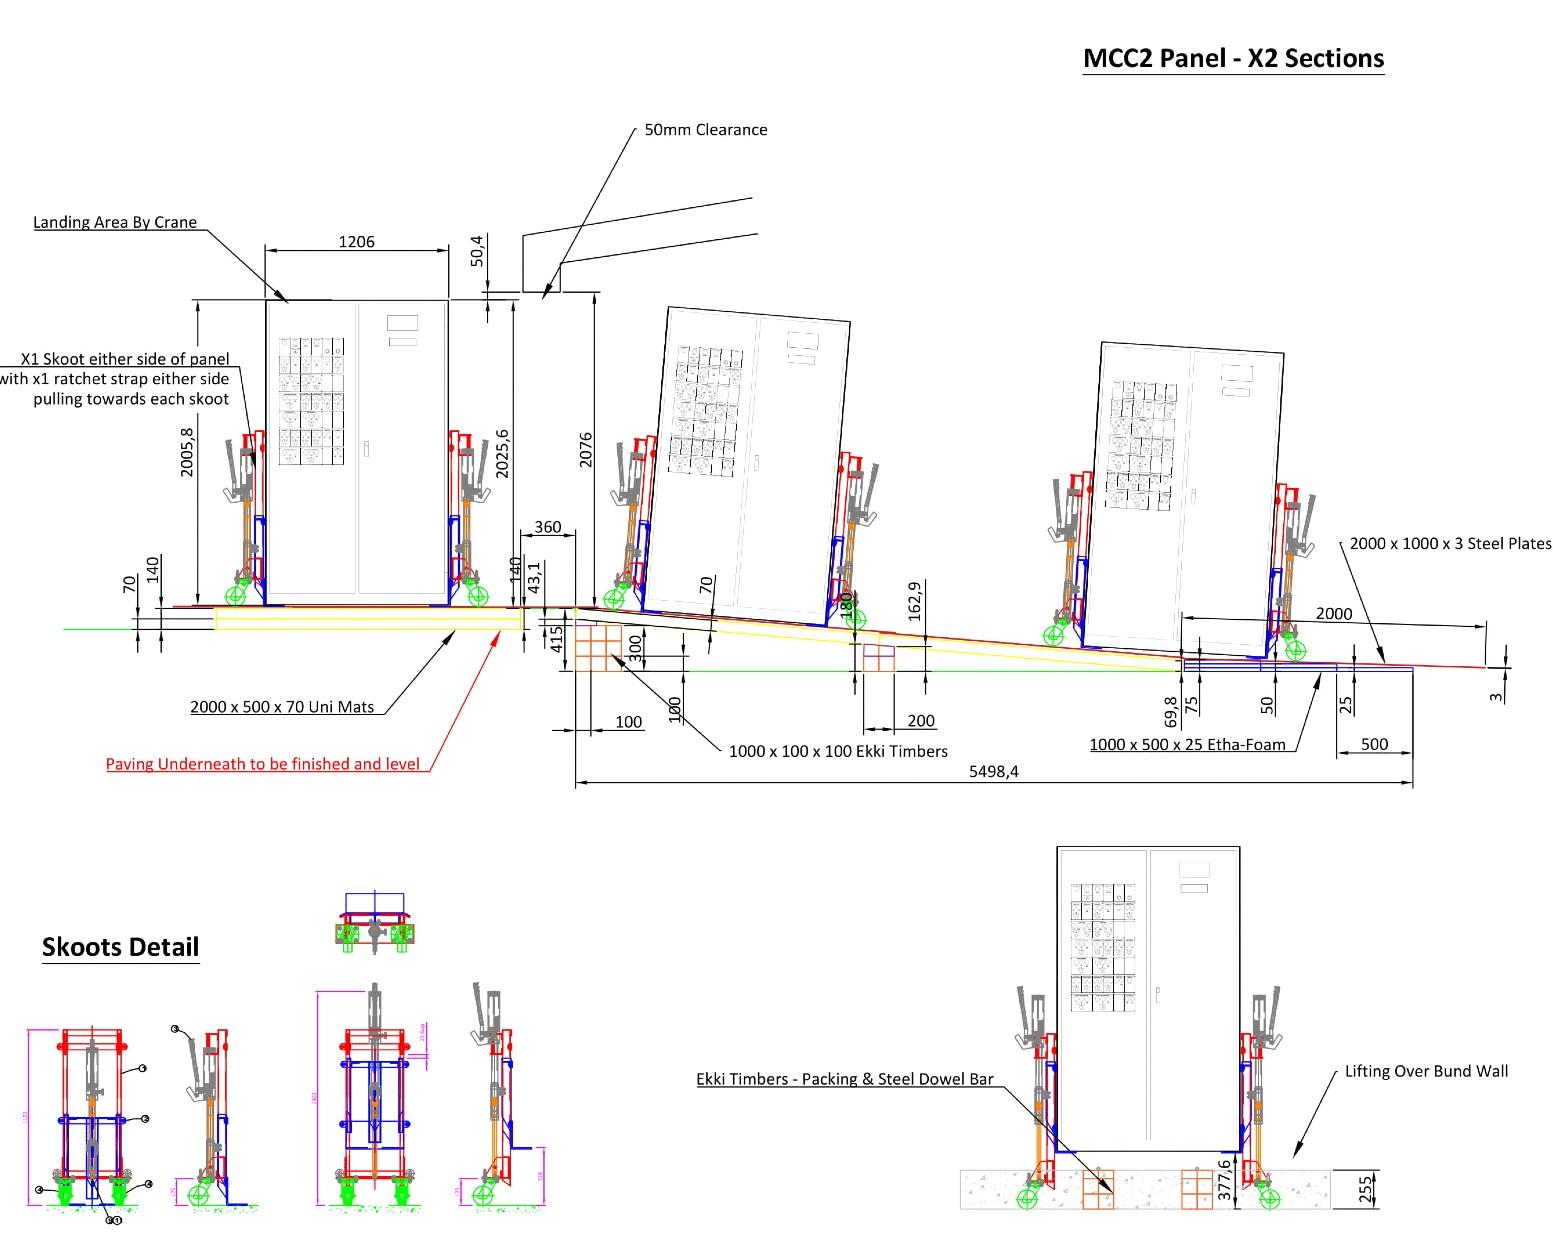 MCH-DBS-WD-UOB-CP-001-1 (1)